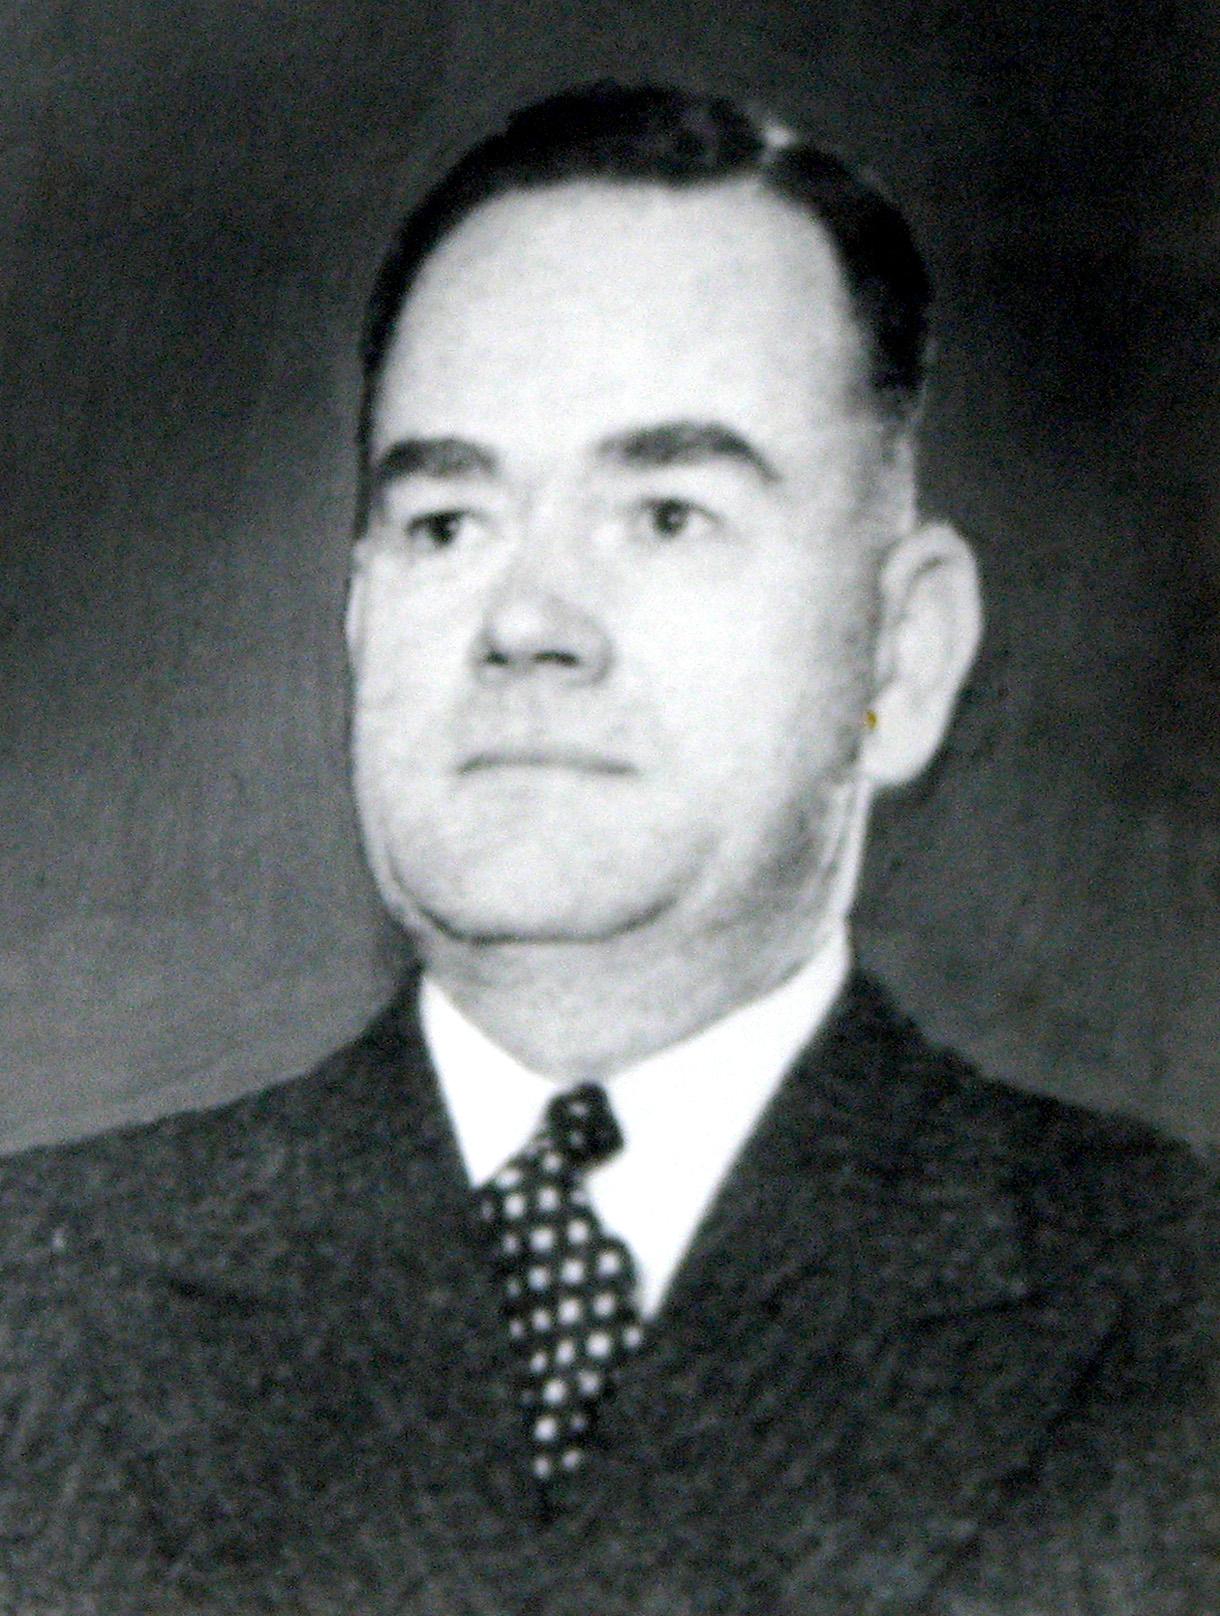 Mayor Fred D. Lamont